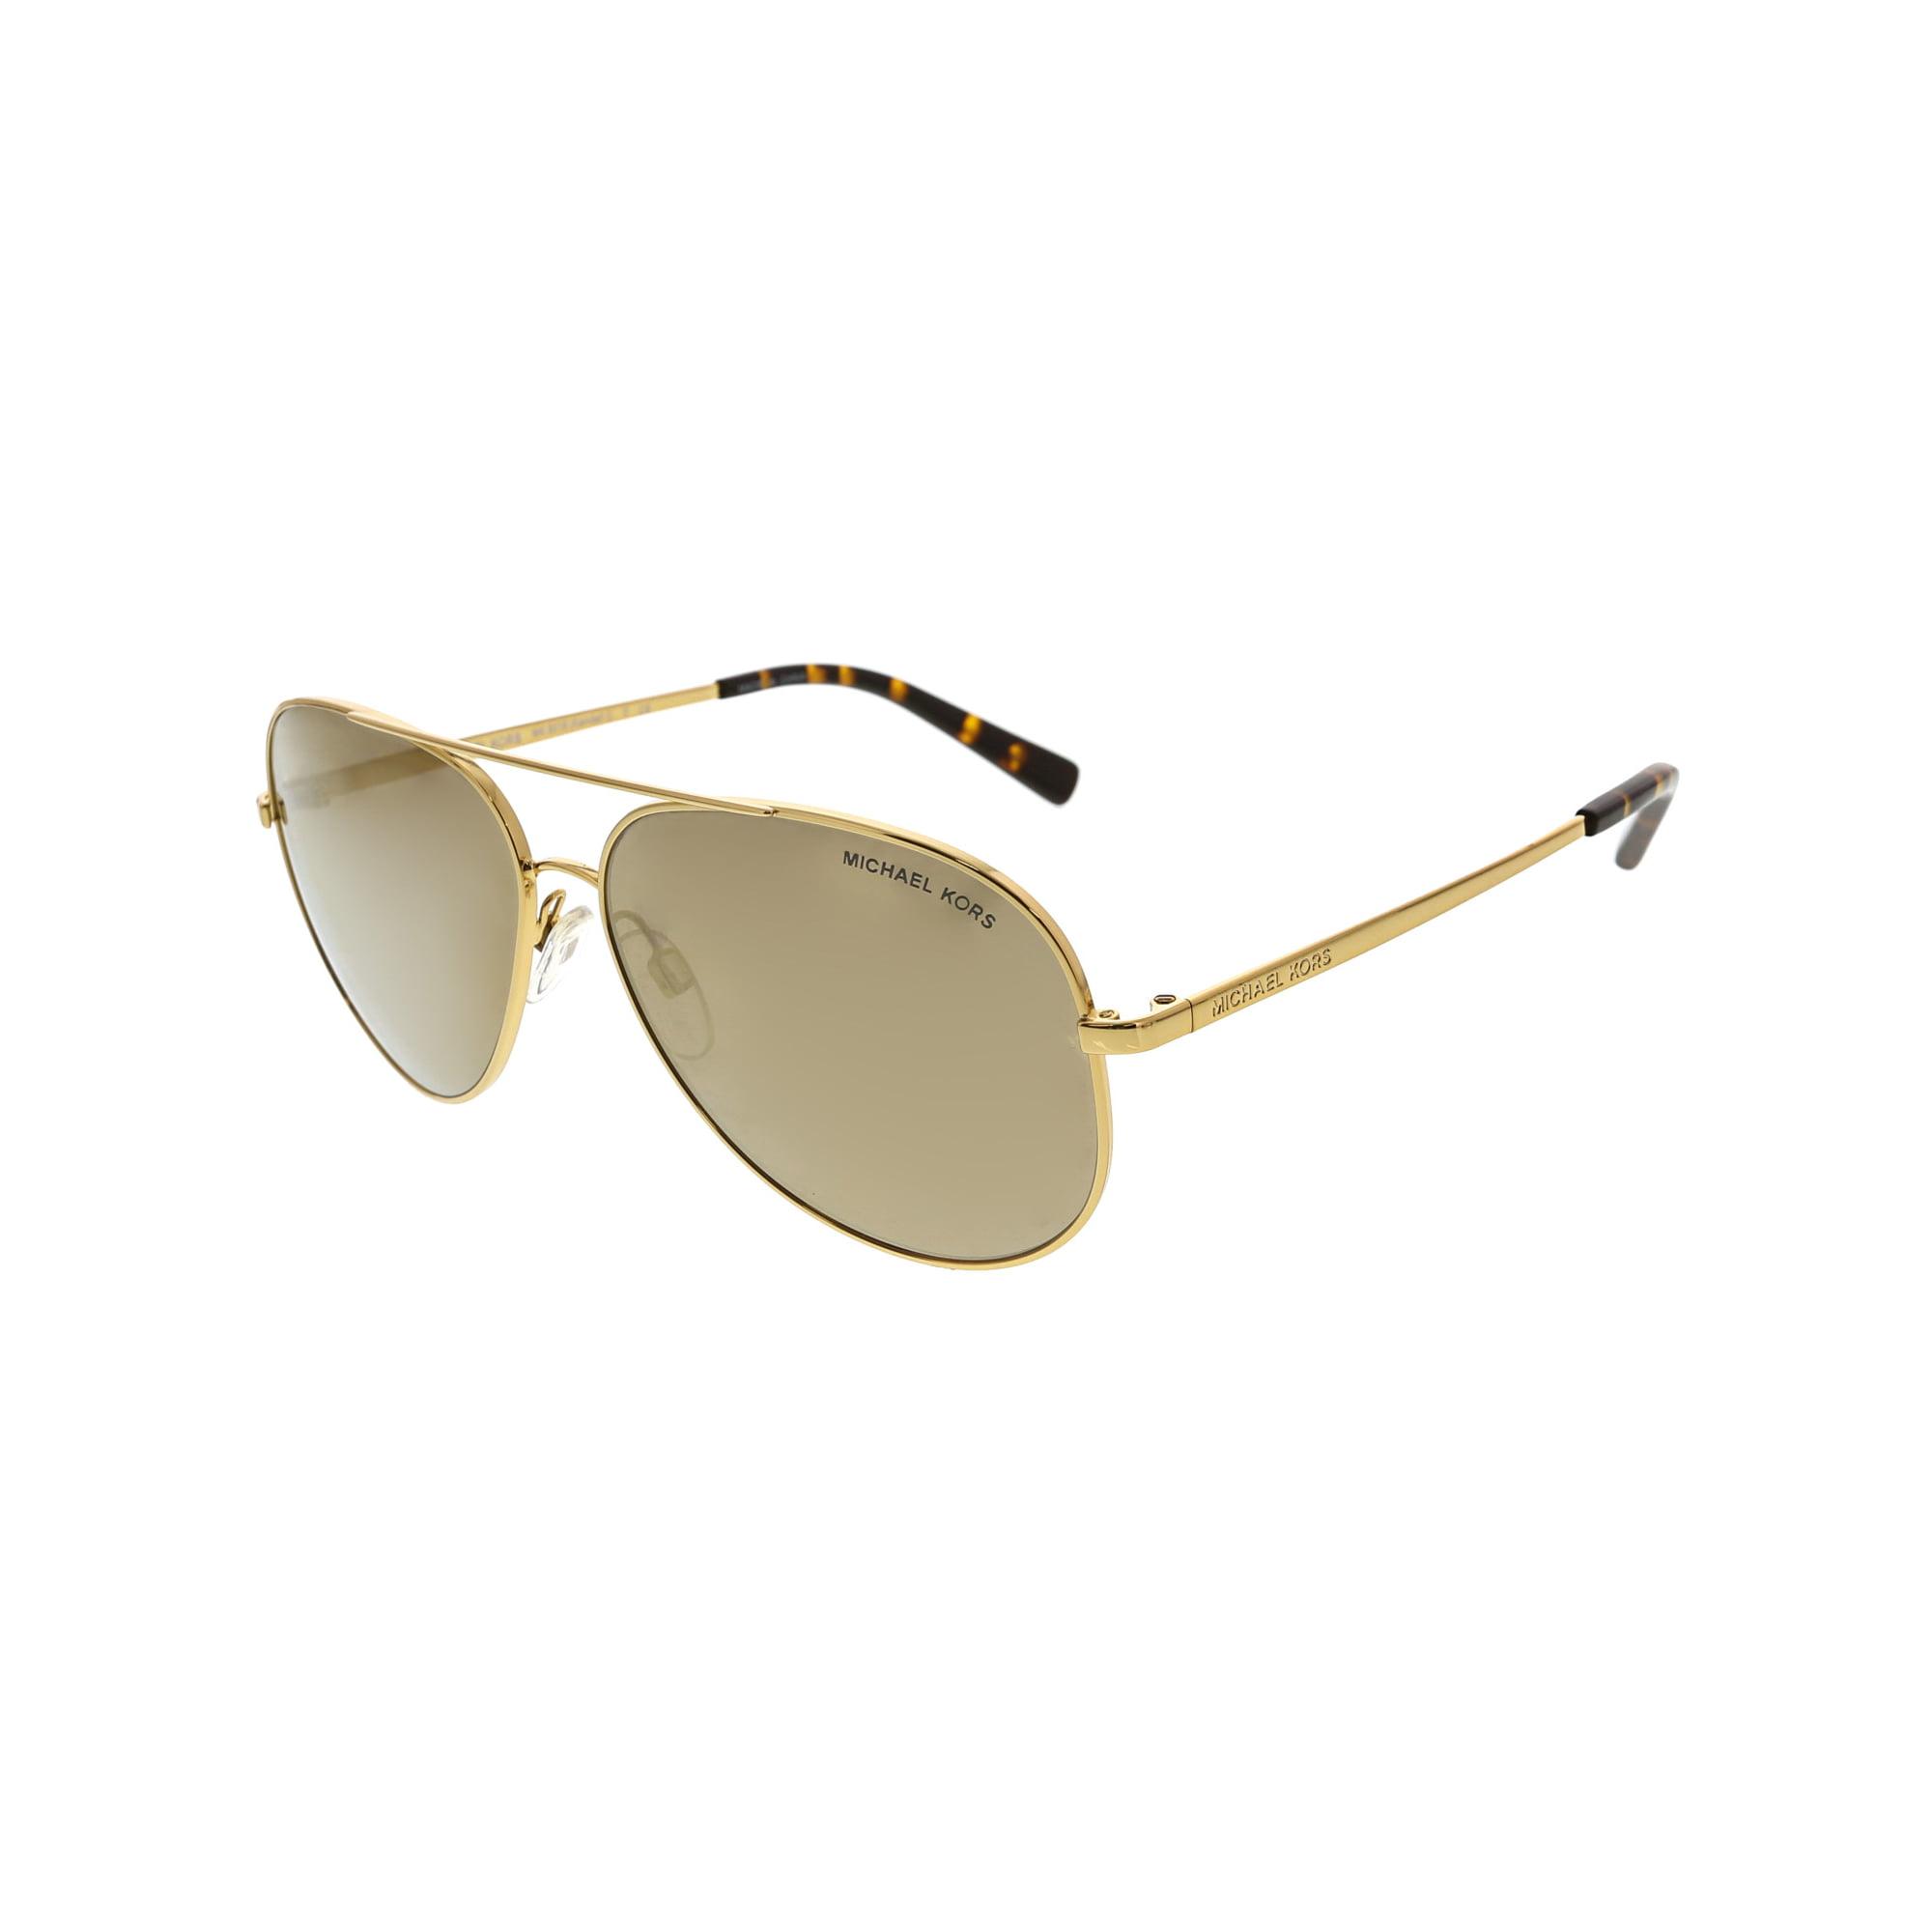 4e68a599c Michael Kors Women's Chelsea MK5004-1017R1-59 Gold Aviator Sunglasses |  Walmart Canada